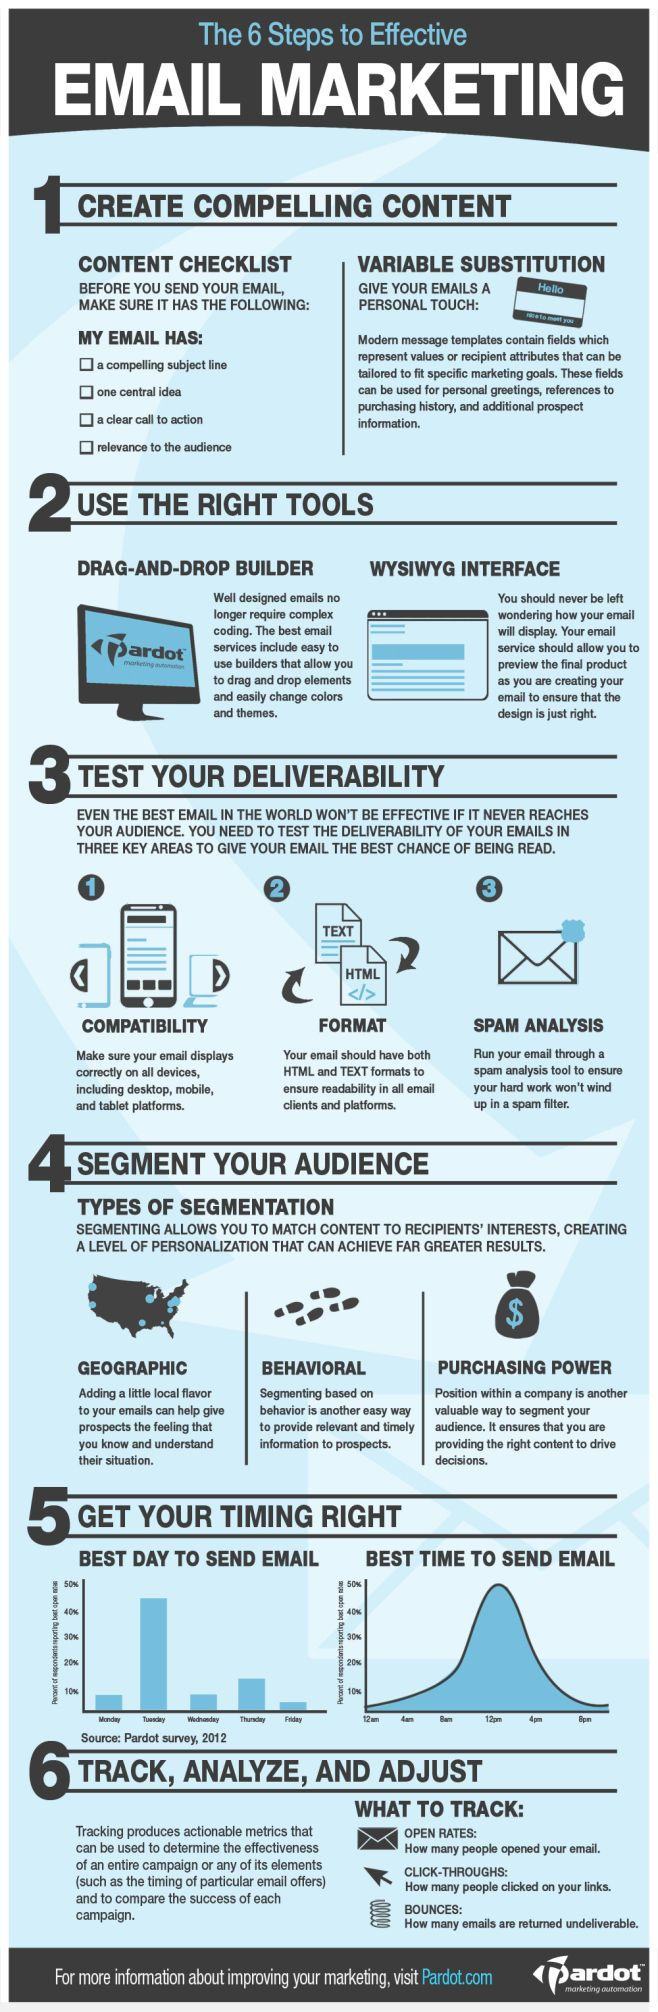 Email maketing #infographic #marketing